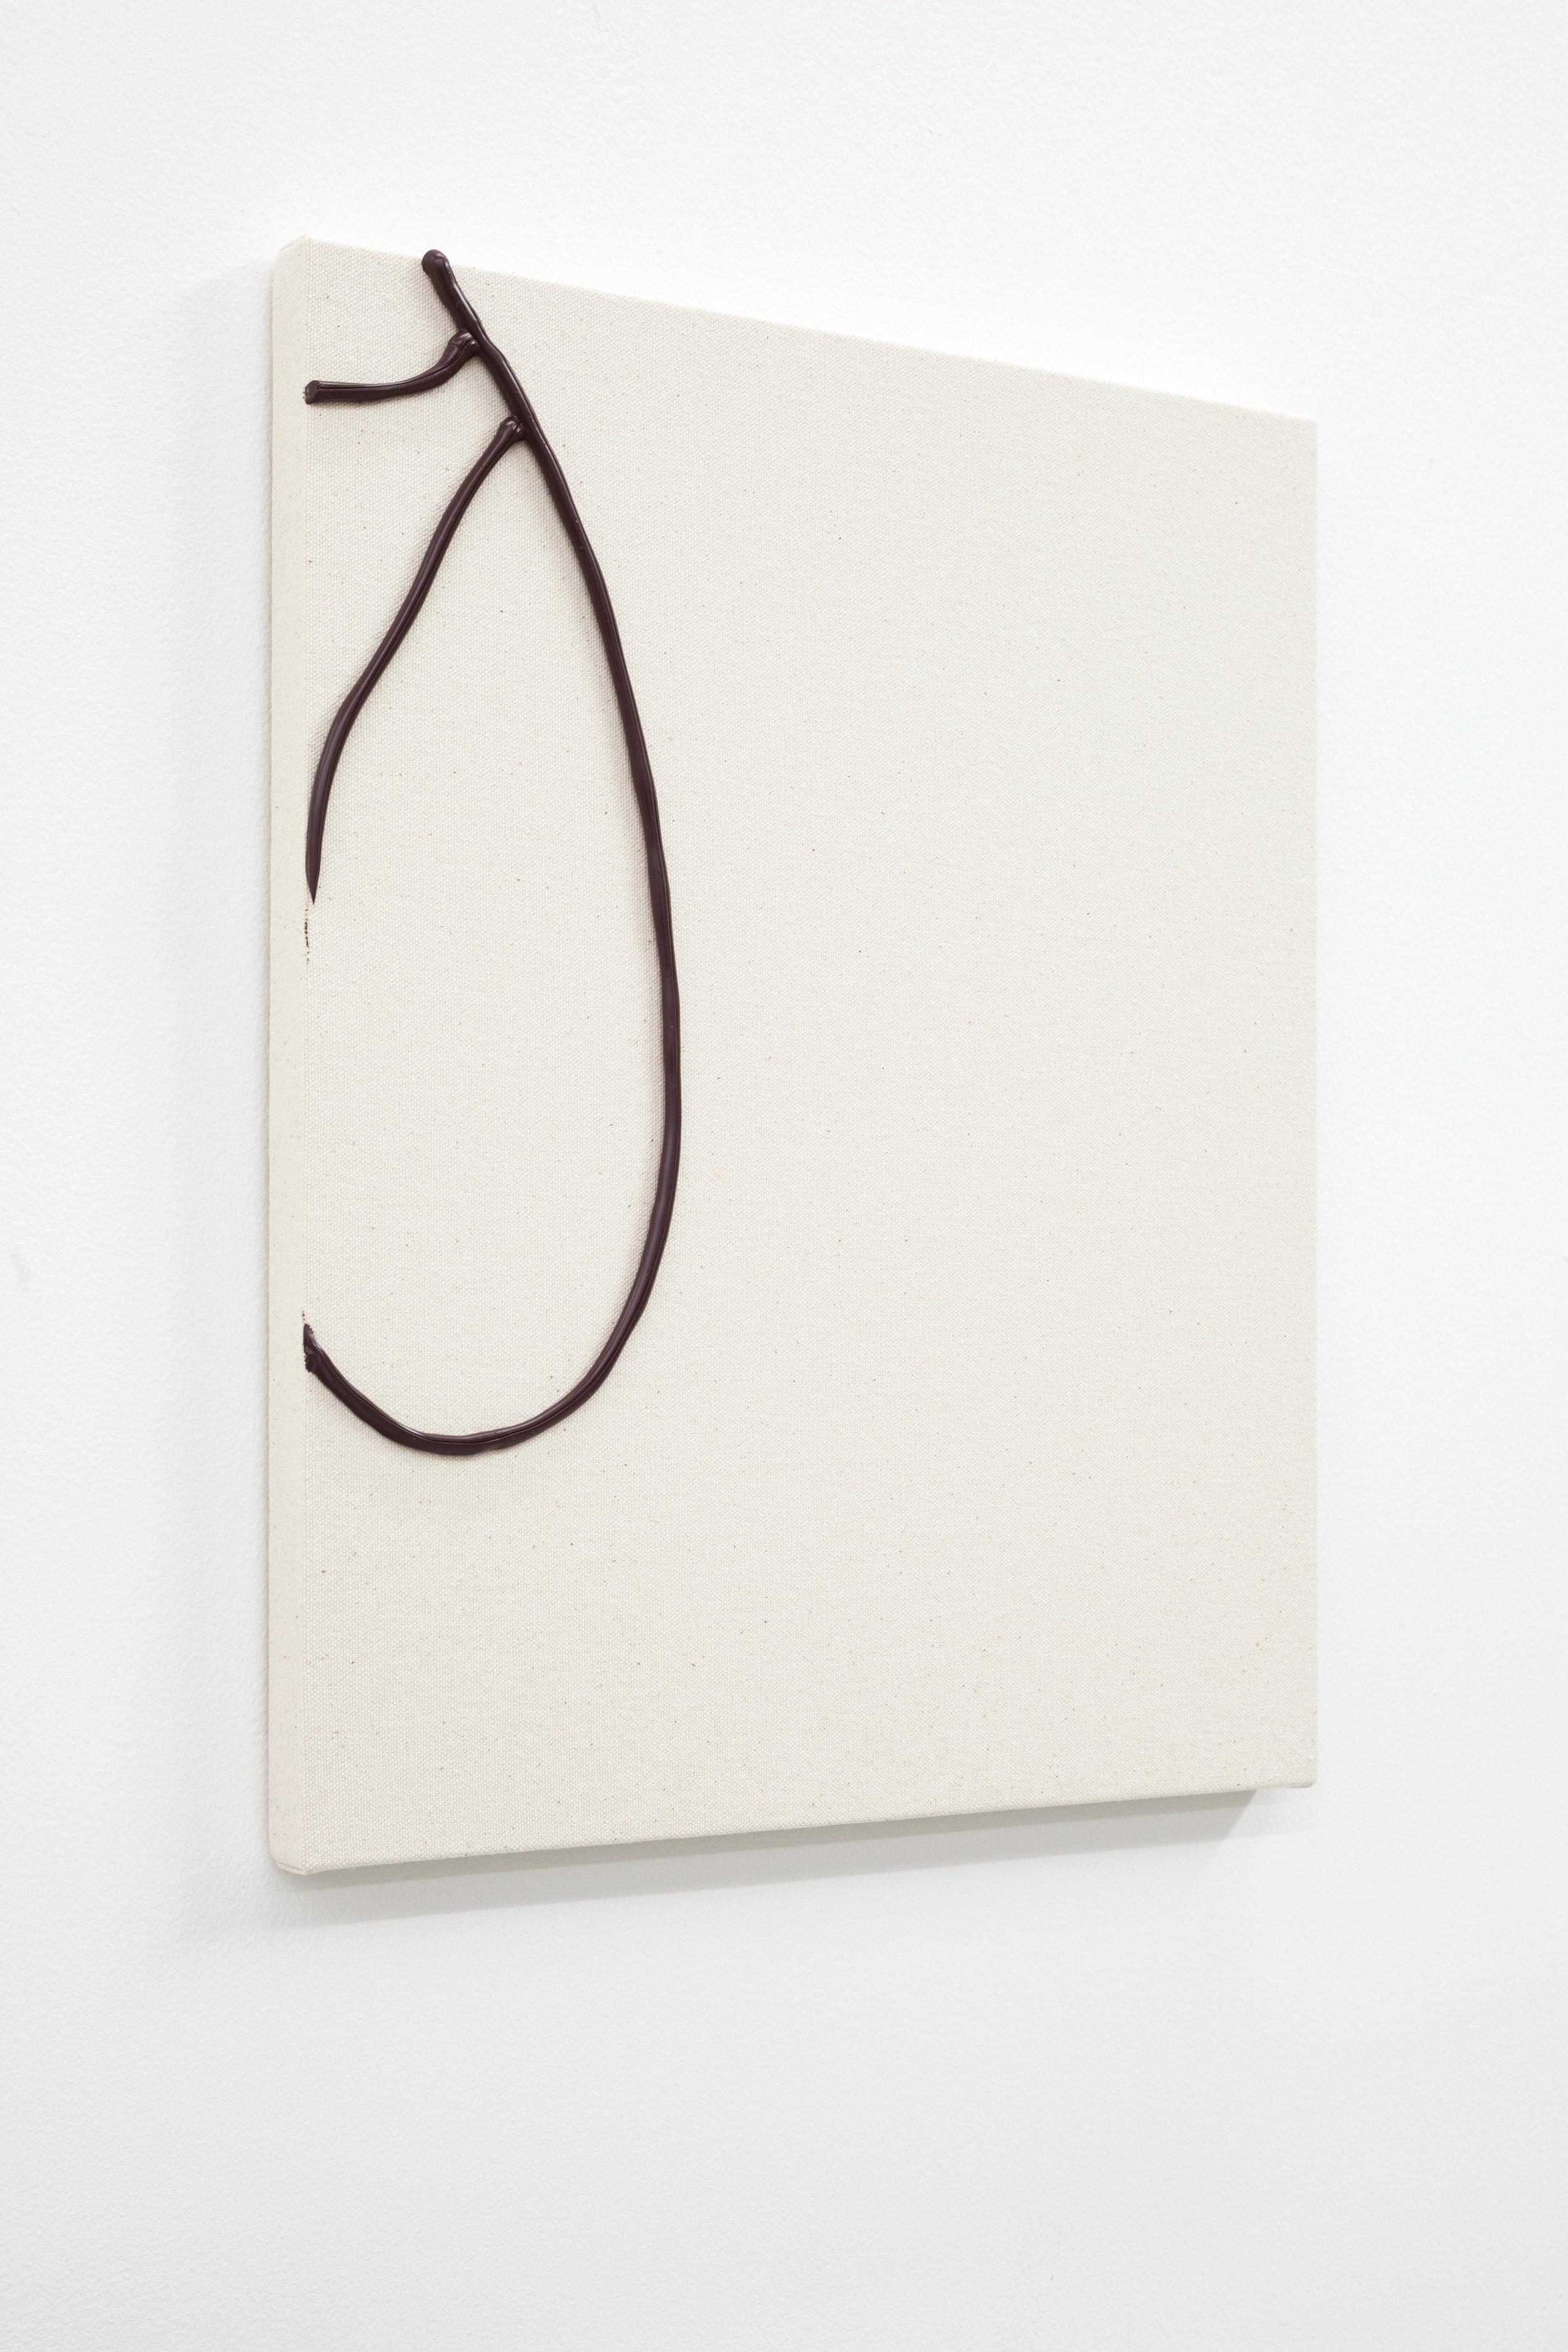 Omari Douglin,  Untitled (Butt Painting),  2019, Caulk on Raw Canvas, 16x13in